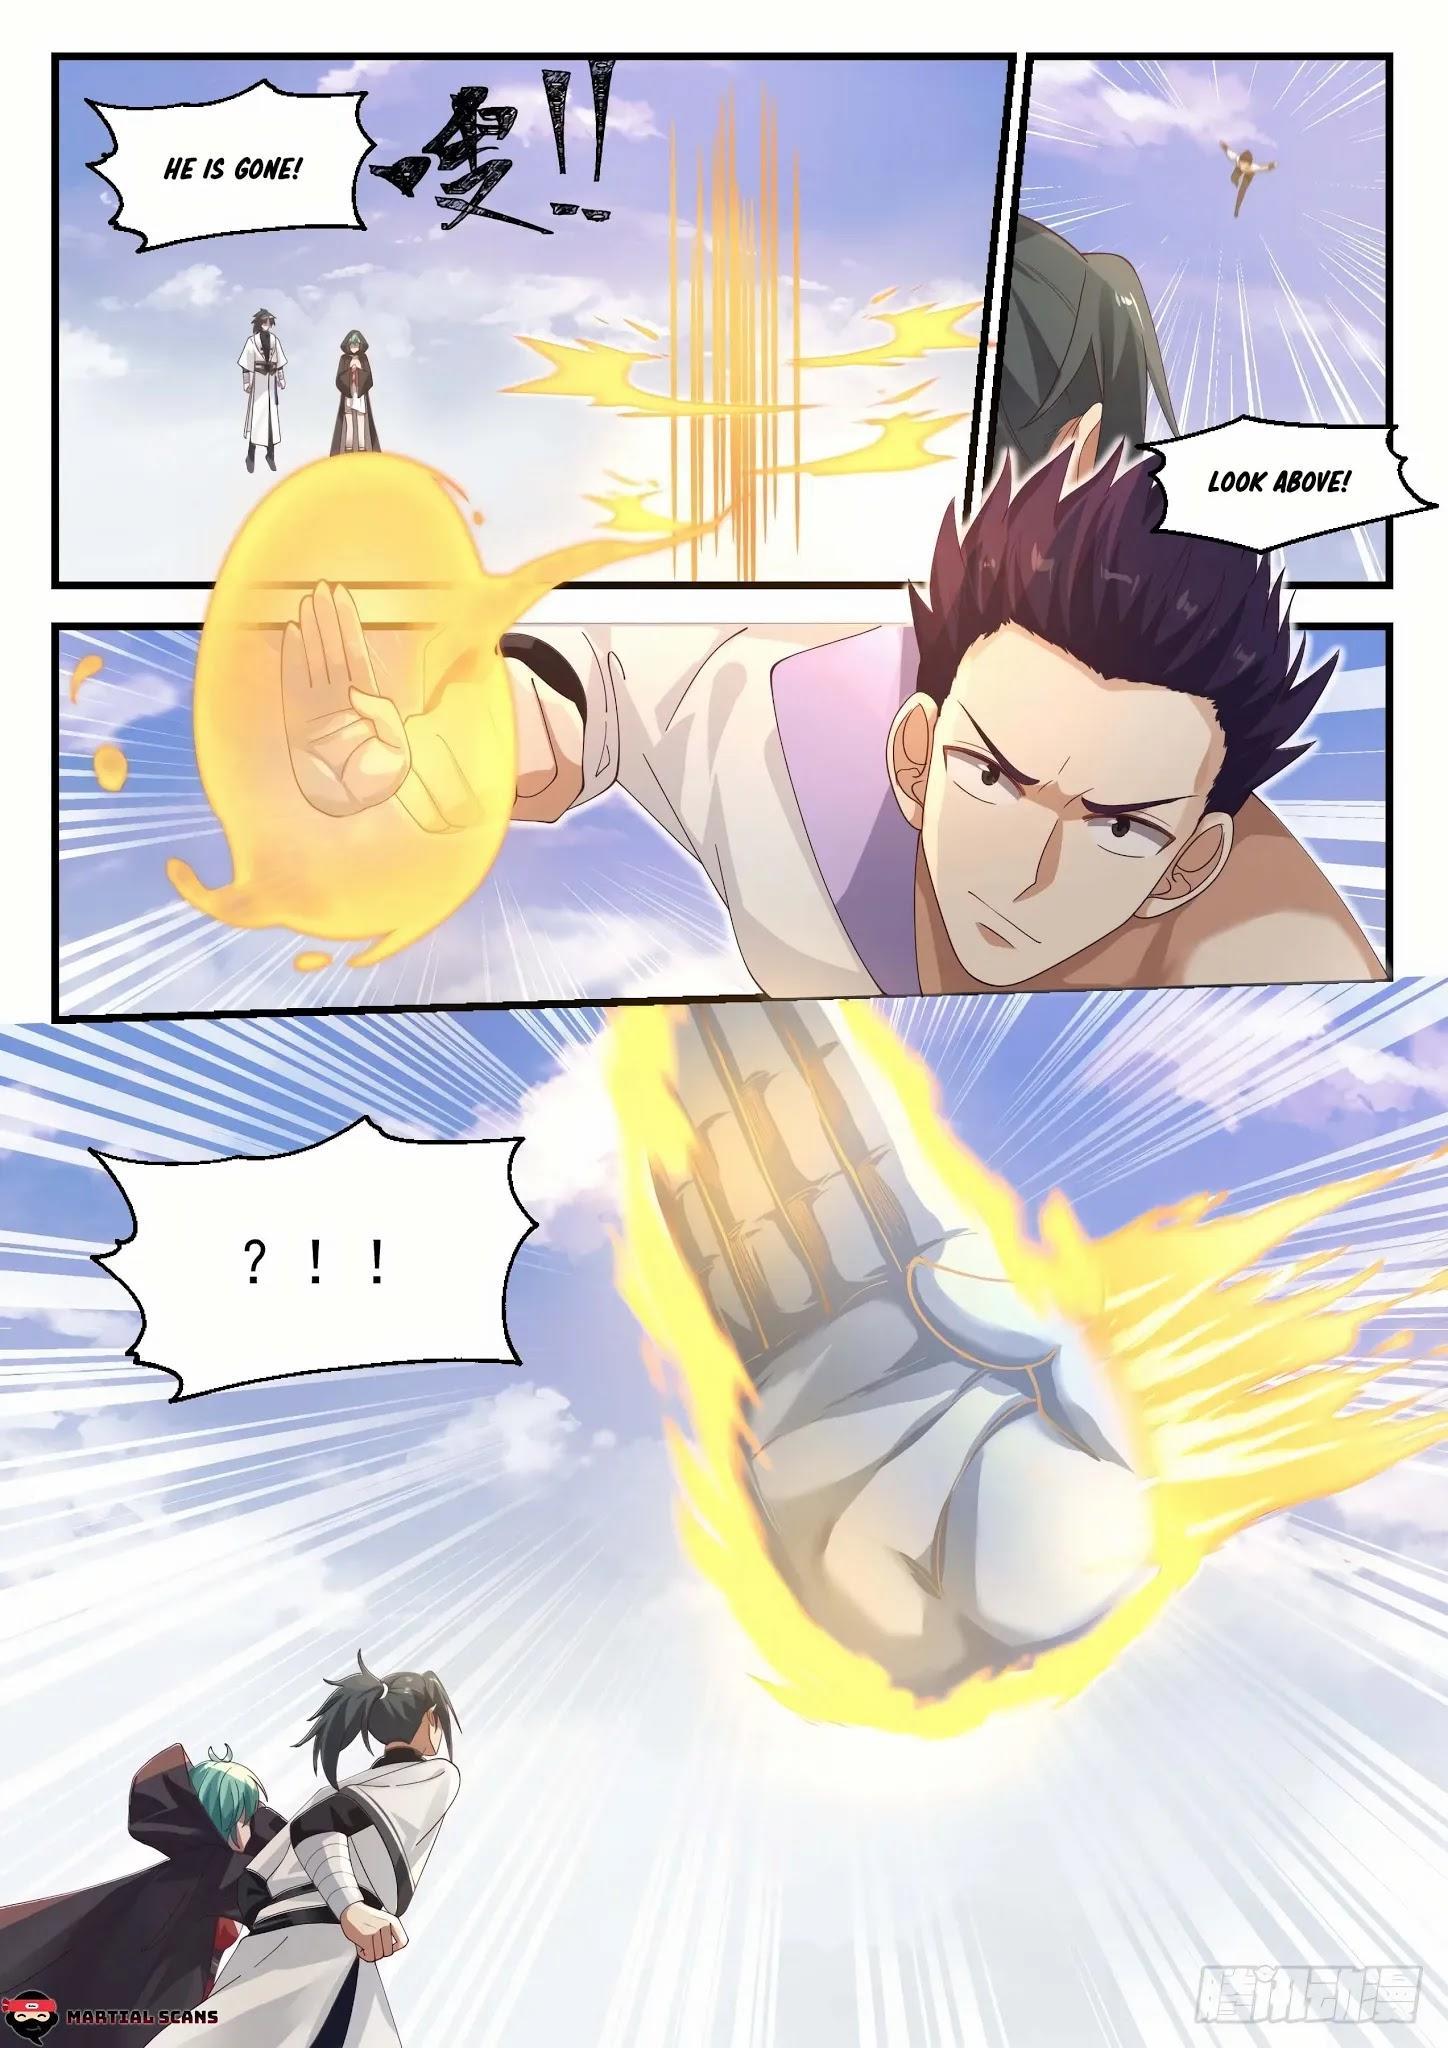 Martial Peak Chapter 1183: Kneel Down page 5 - Mangakakalots.com